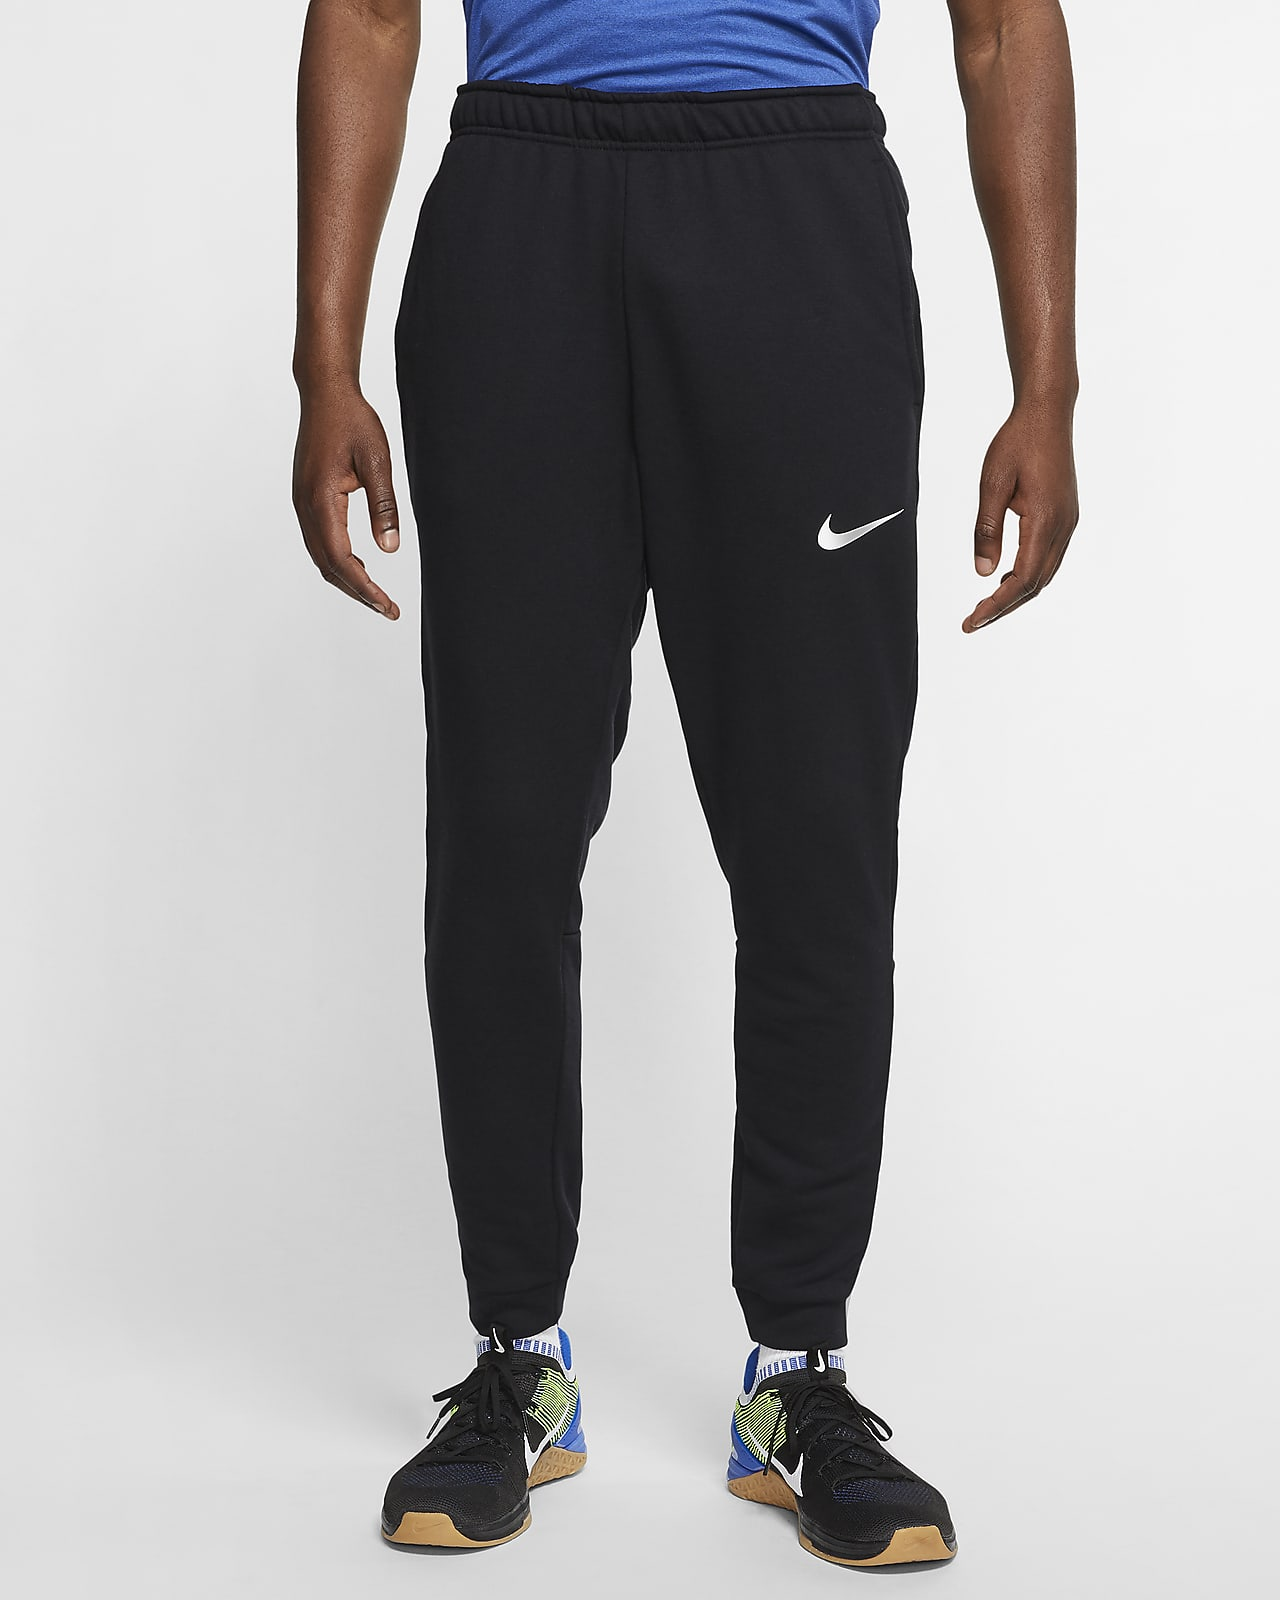 Hobart Presta atención a Sucio  Pantaloni da training in fleece Nike Dri-FIT - Uomo. Nike IT